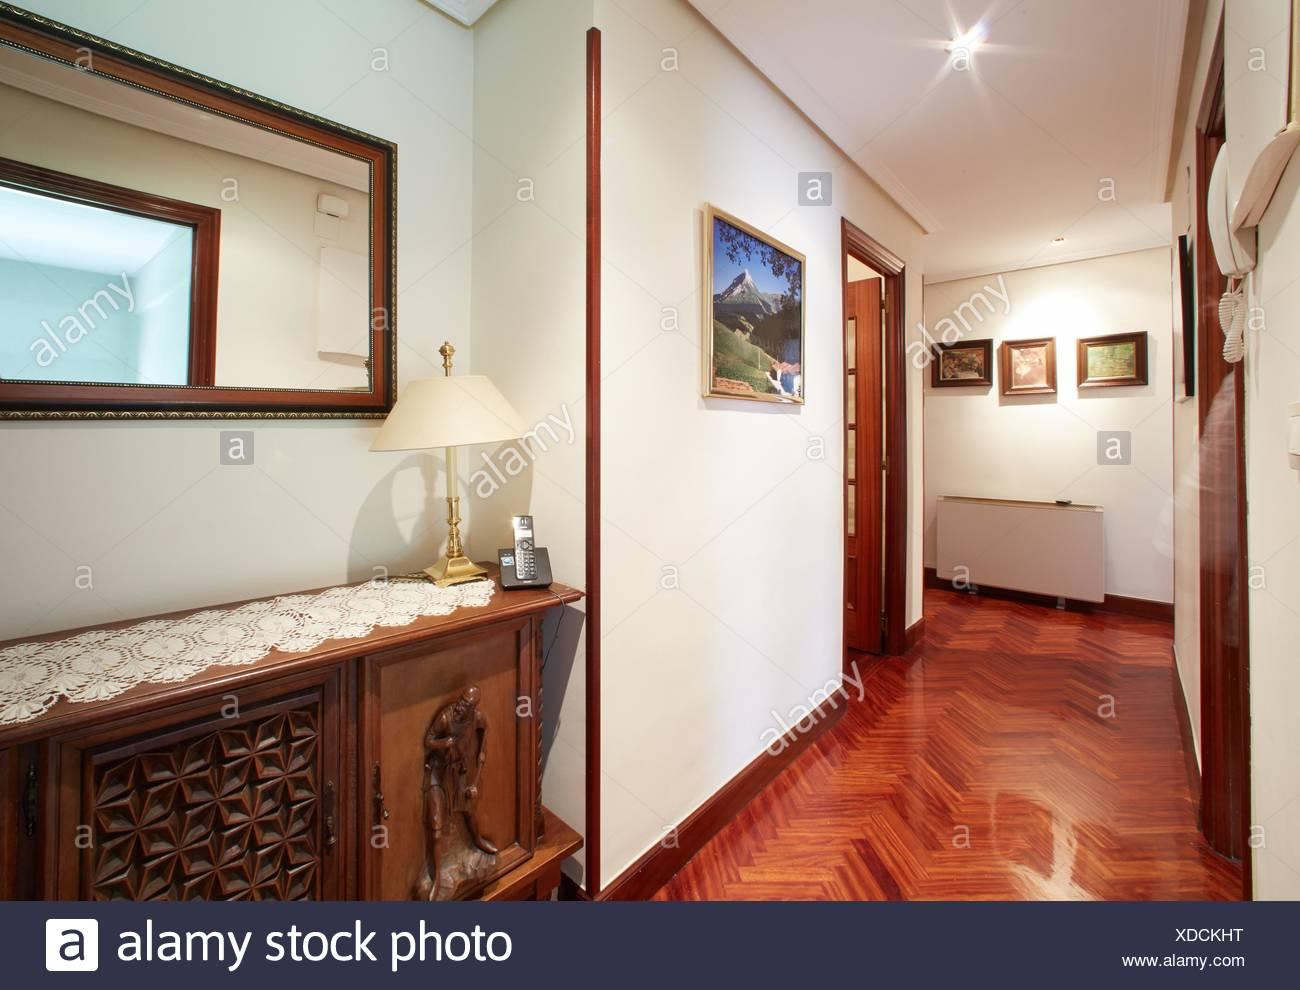 Interior Decoration Door Hall Stock Photos & Interior Decoration ...